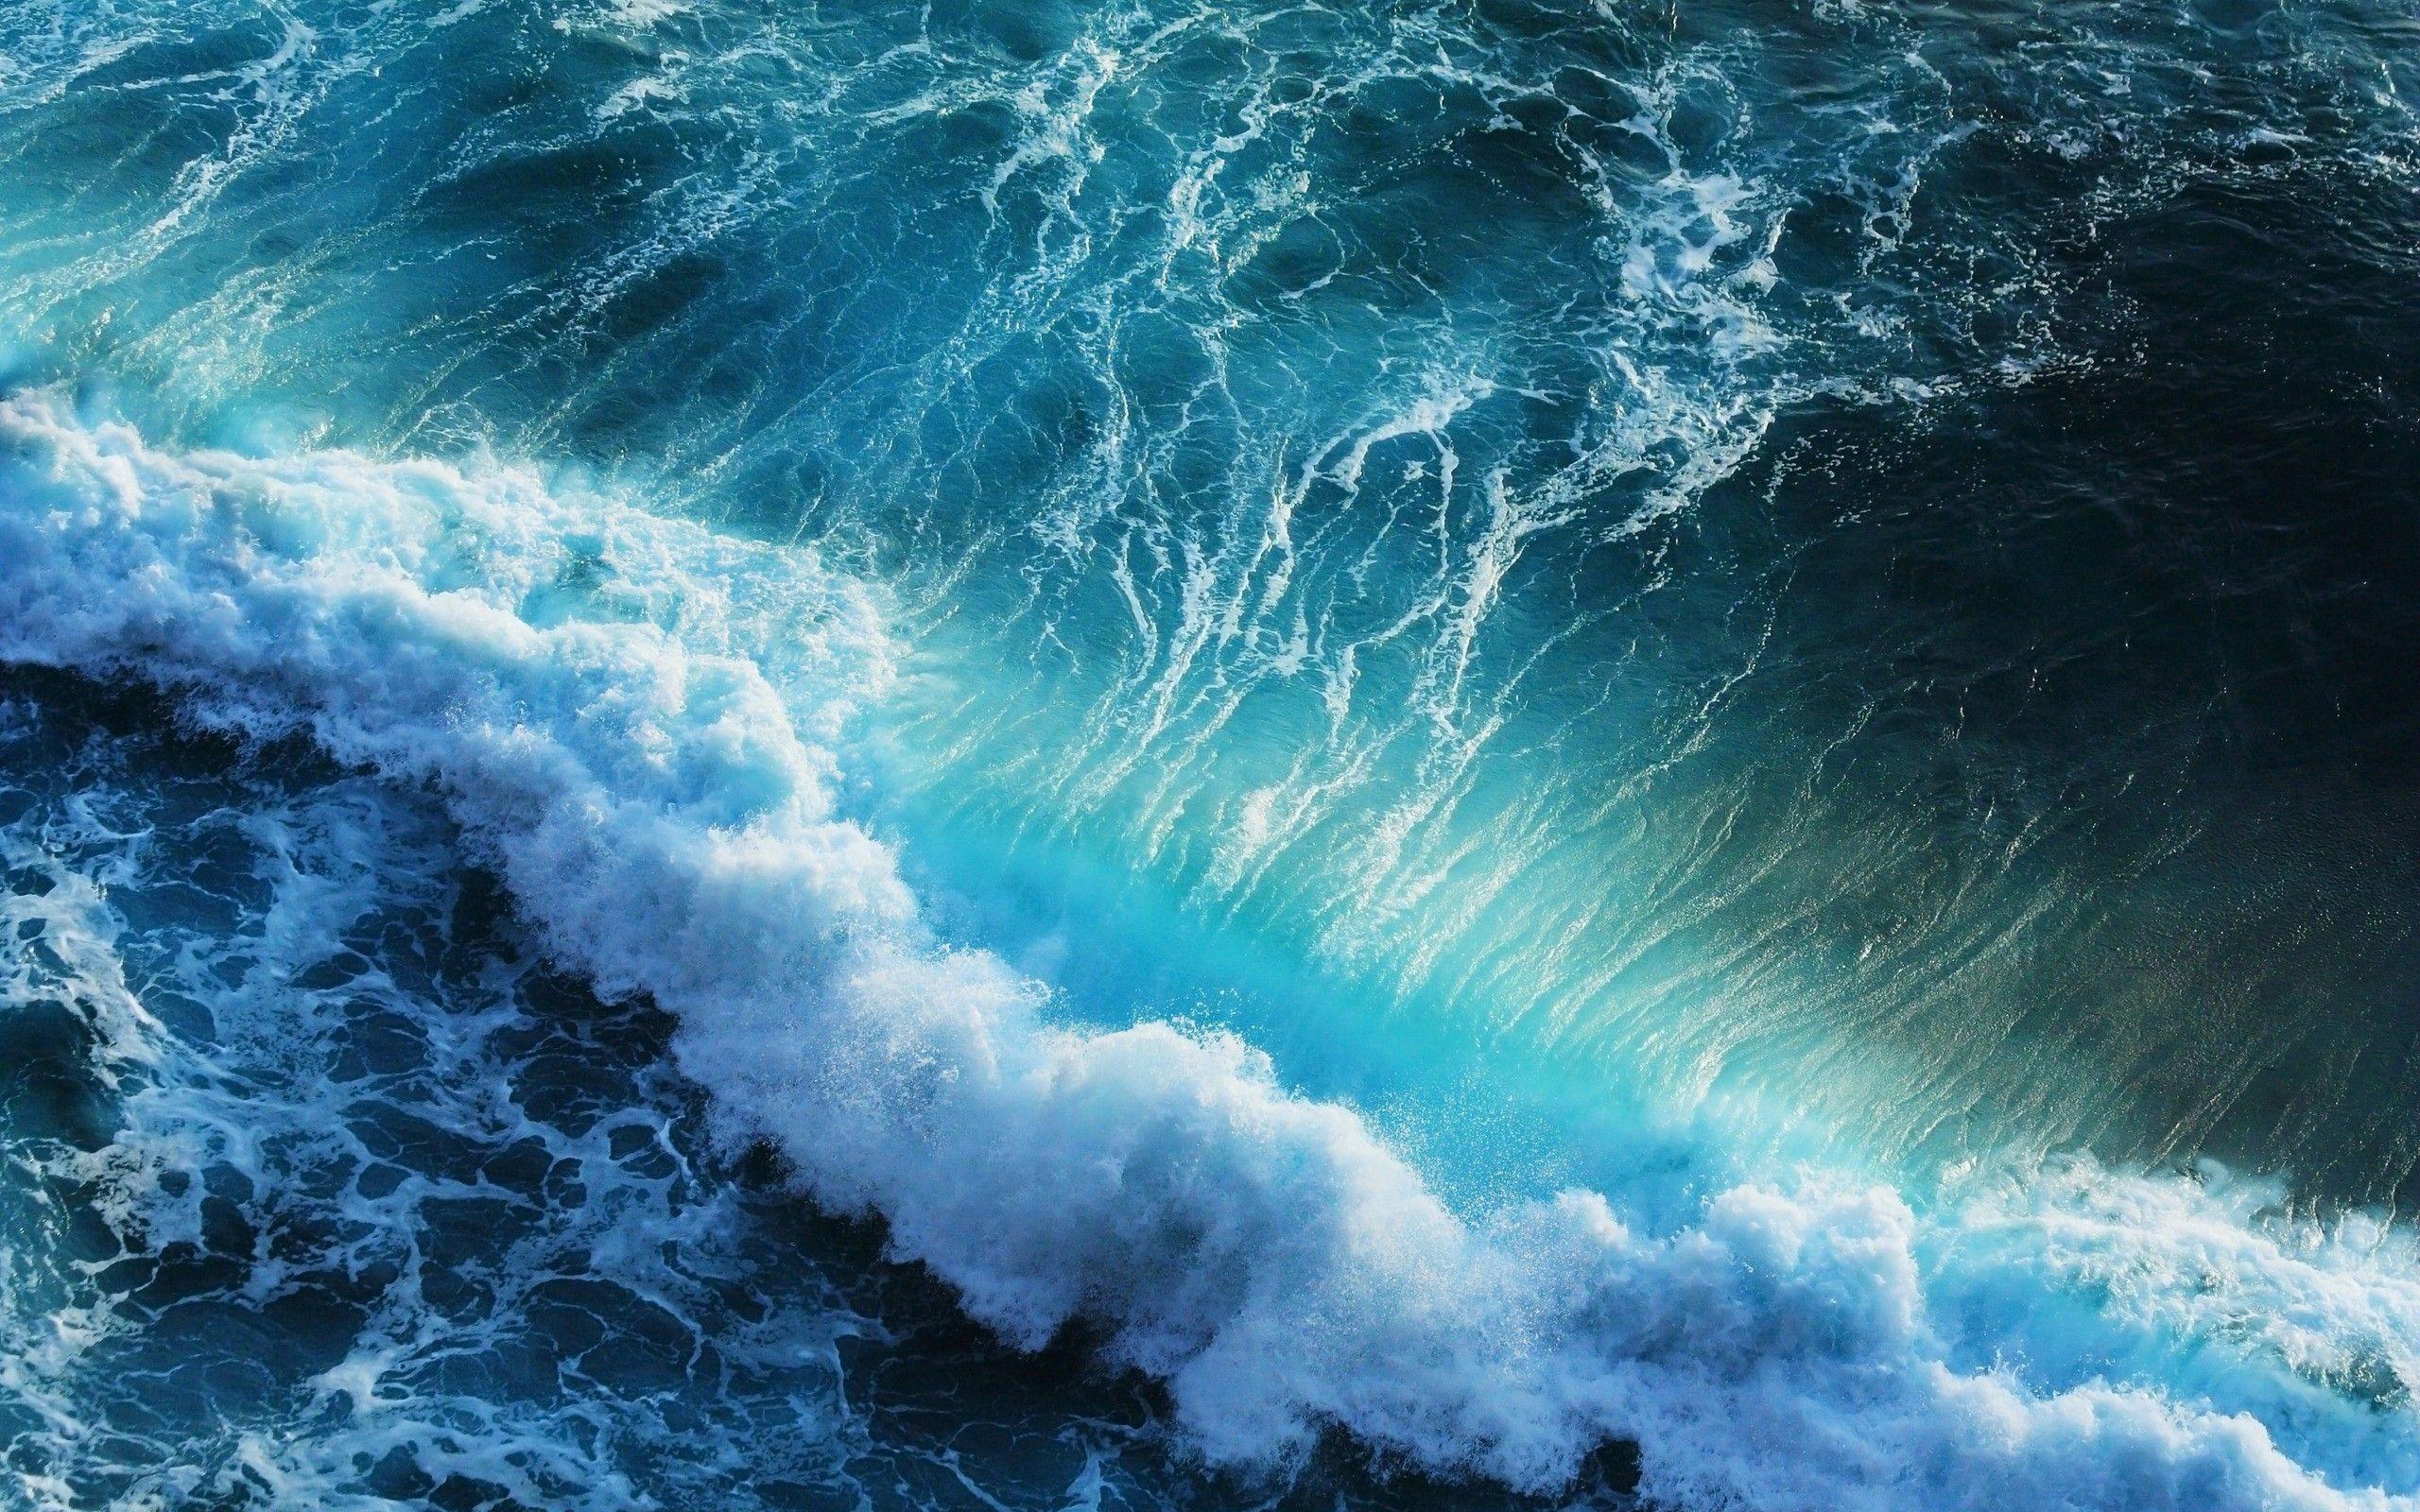 Hd Ocean Wallpapers Top Free Hd Ocean Backgrounds Wallpaperaccess